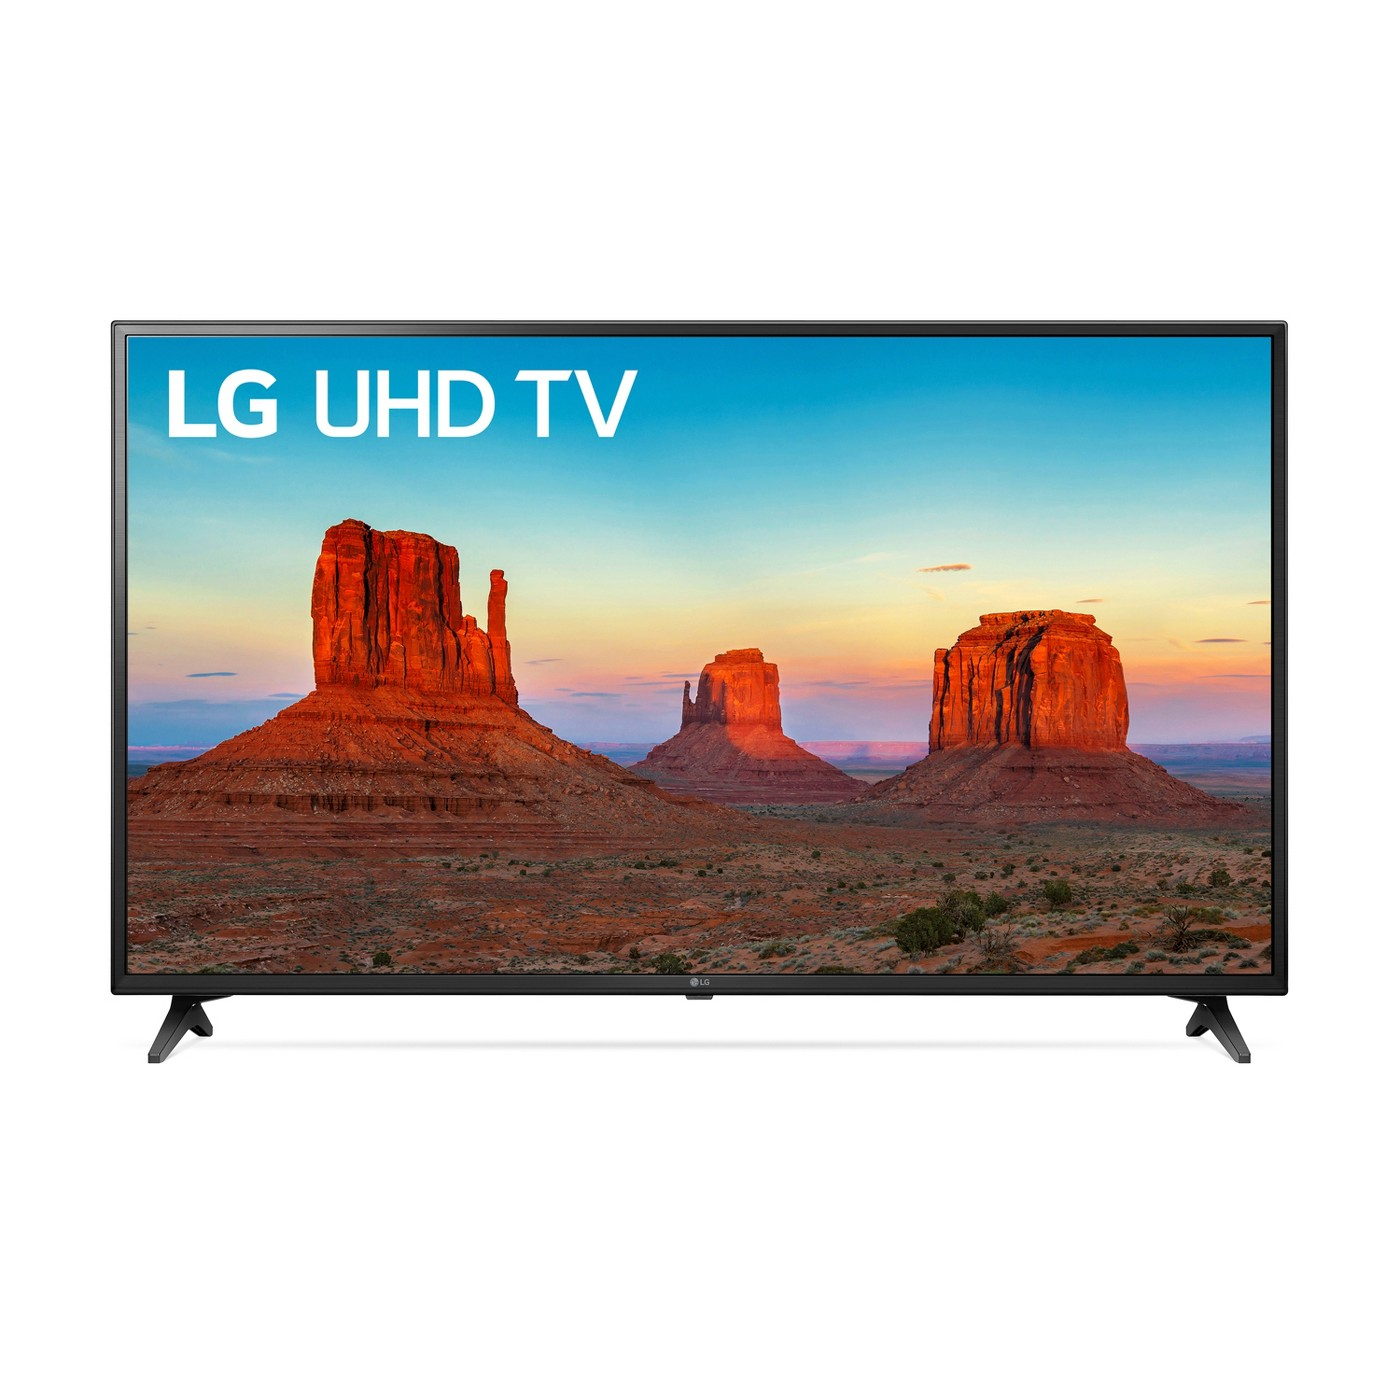 "LG® 60"" 4K Ultra HD Smart LED TV - image 1 of 13"